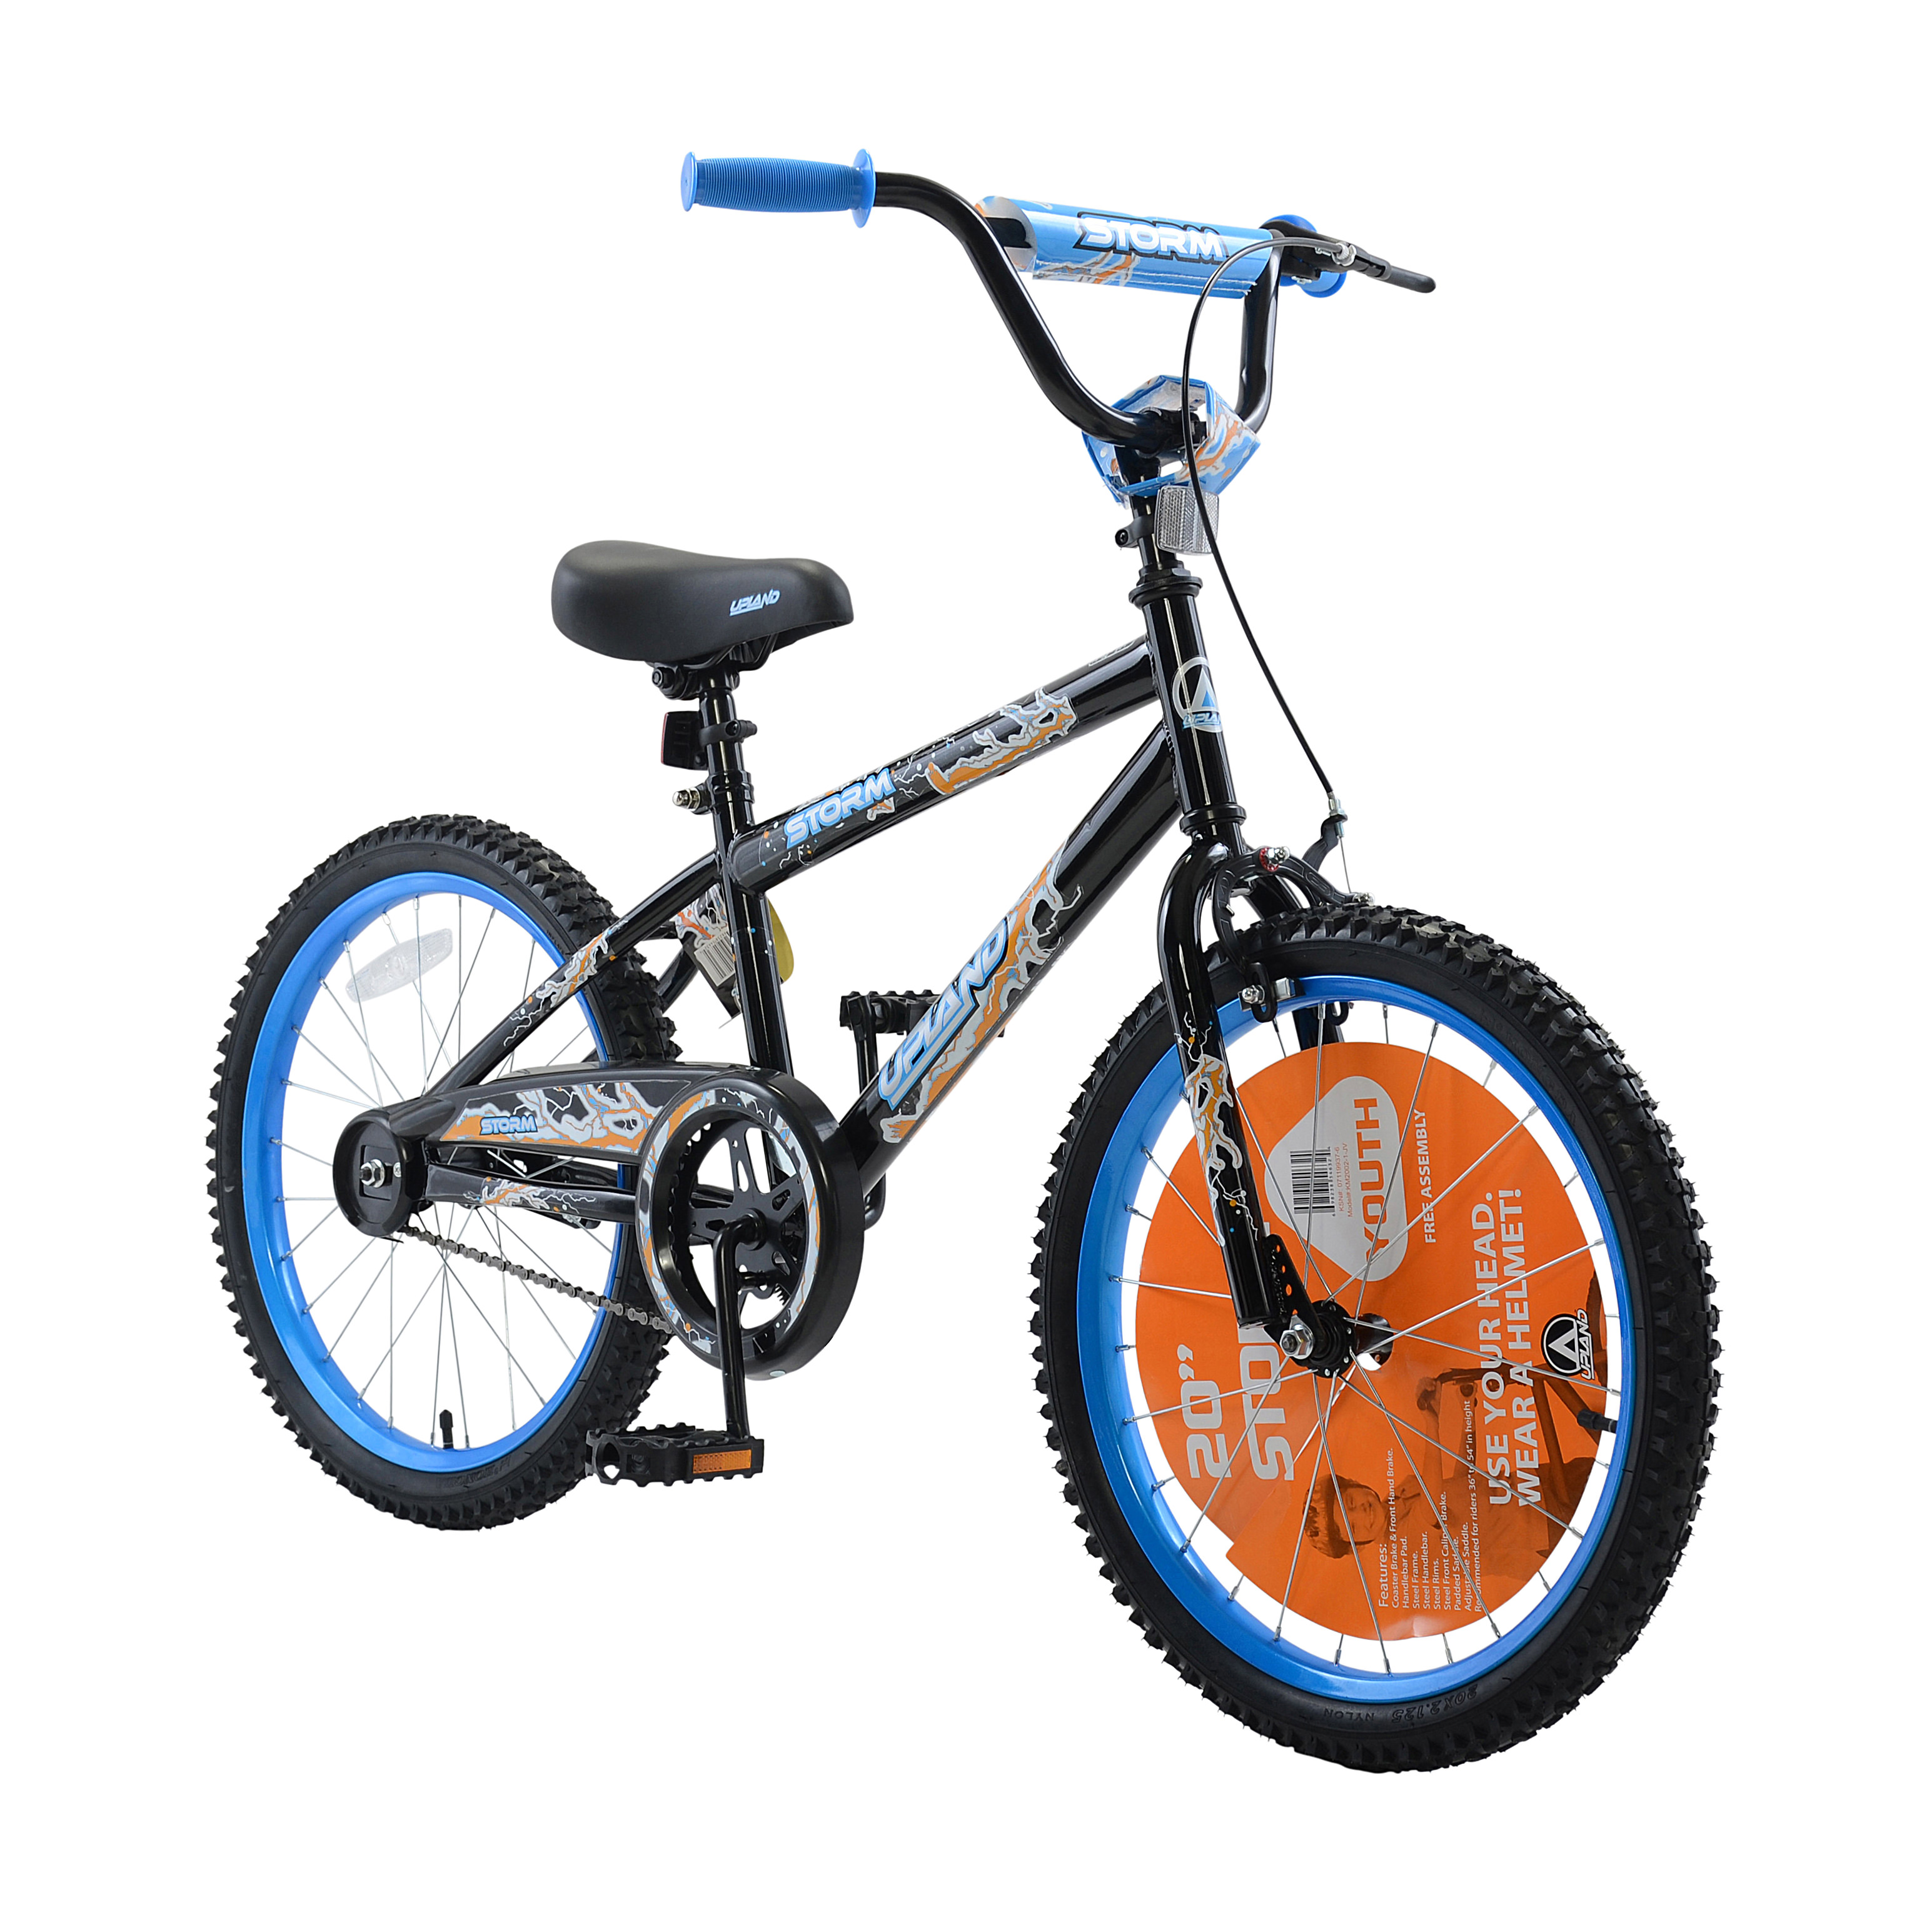 "Storm 20"" Boys Bicycle"